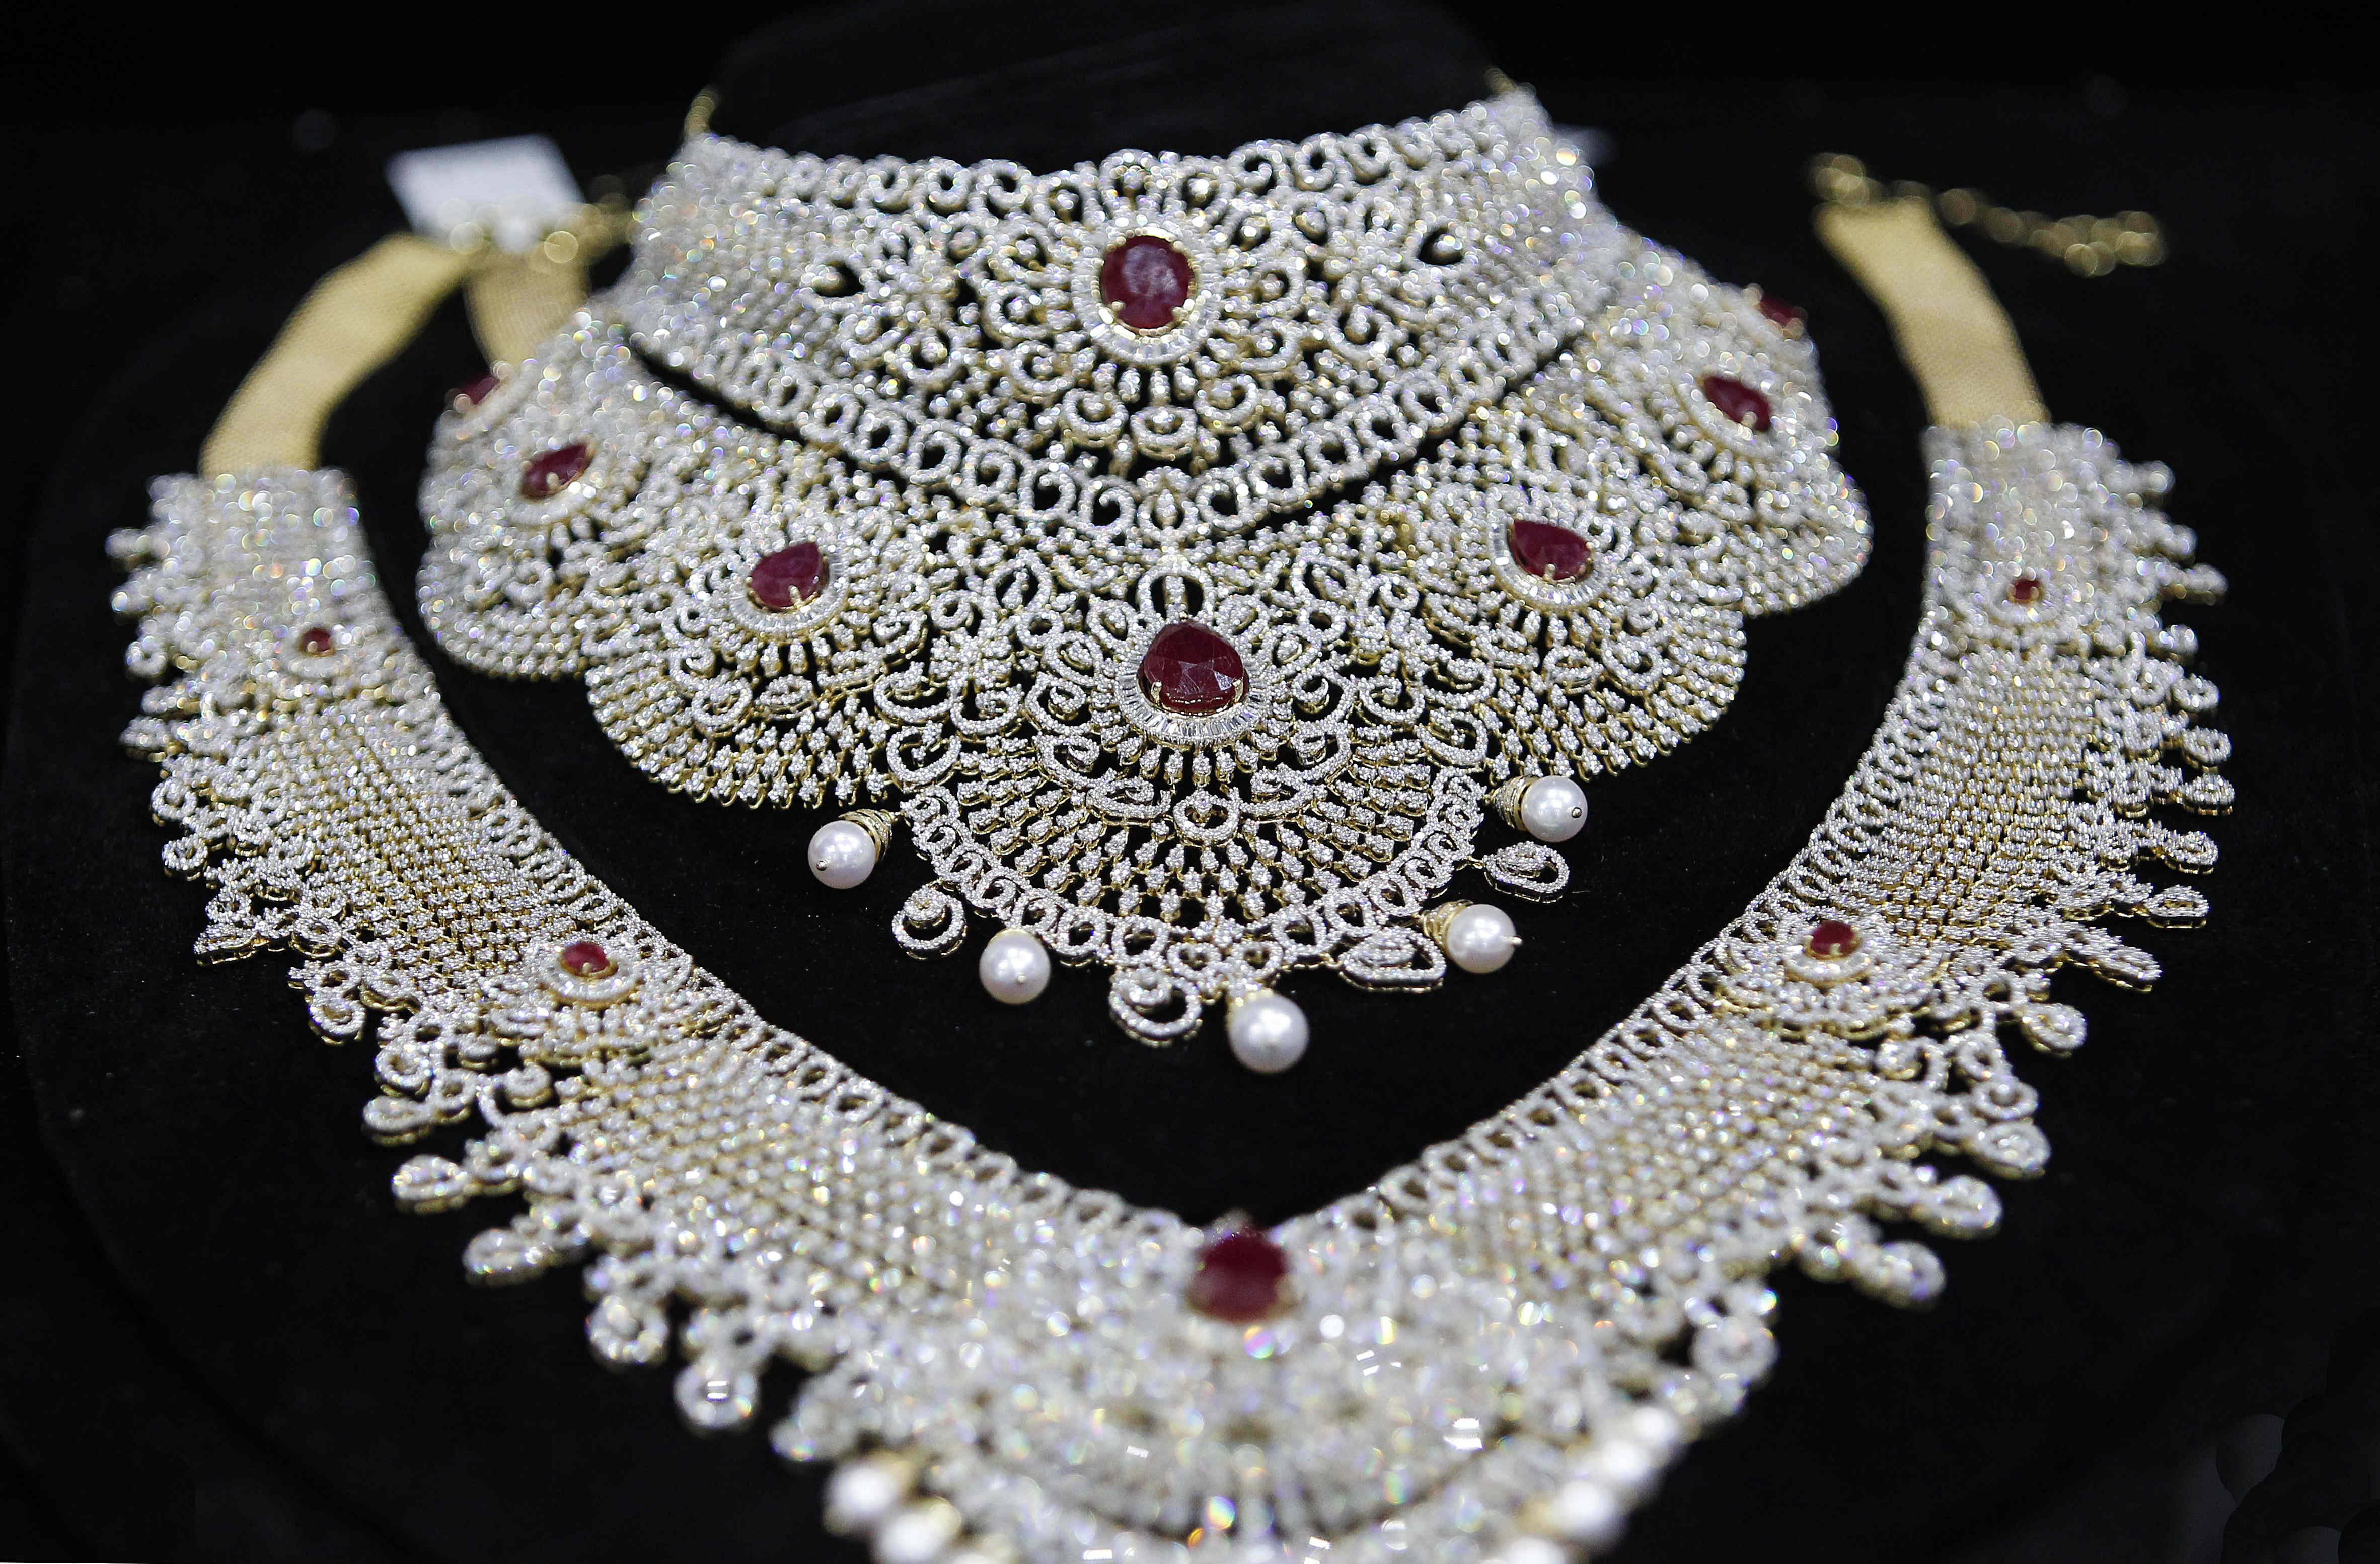 VOD Dubai International Jewellery Show Shines Bright